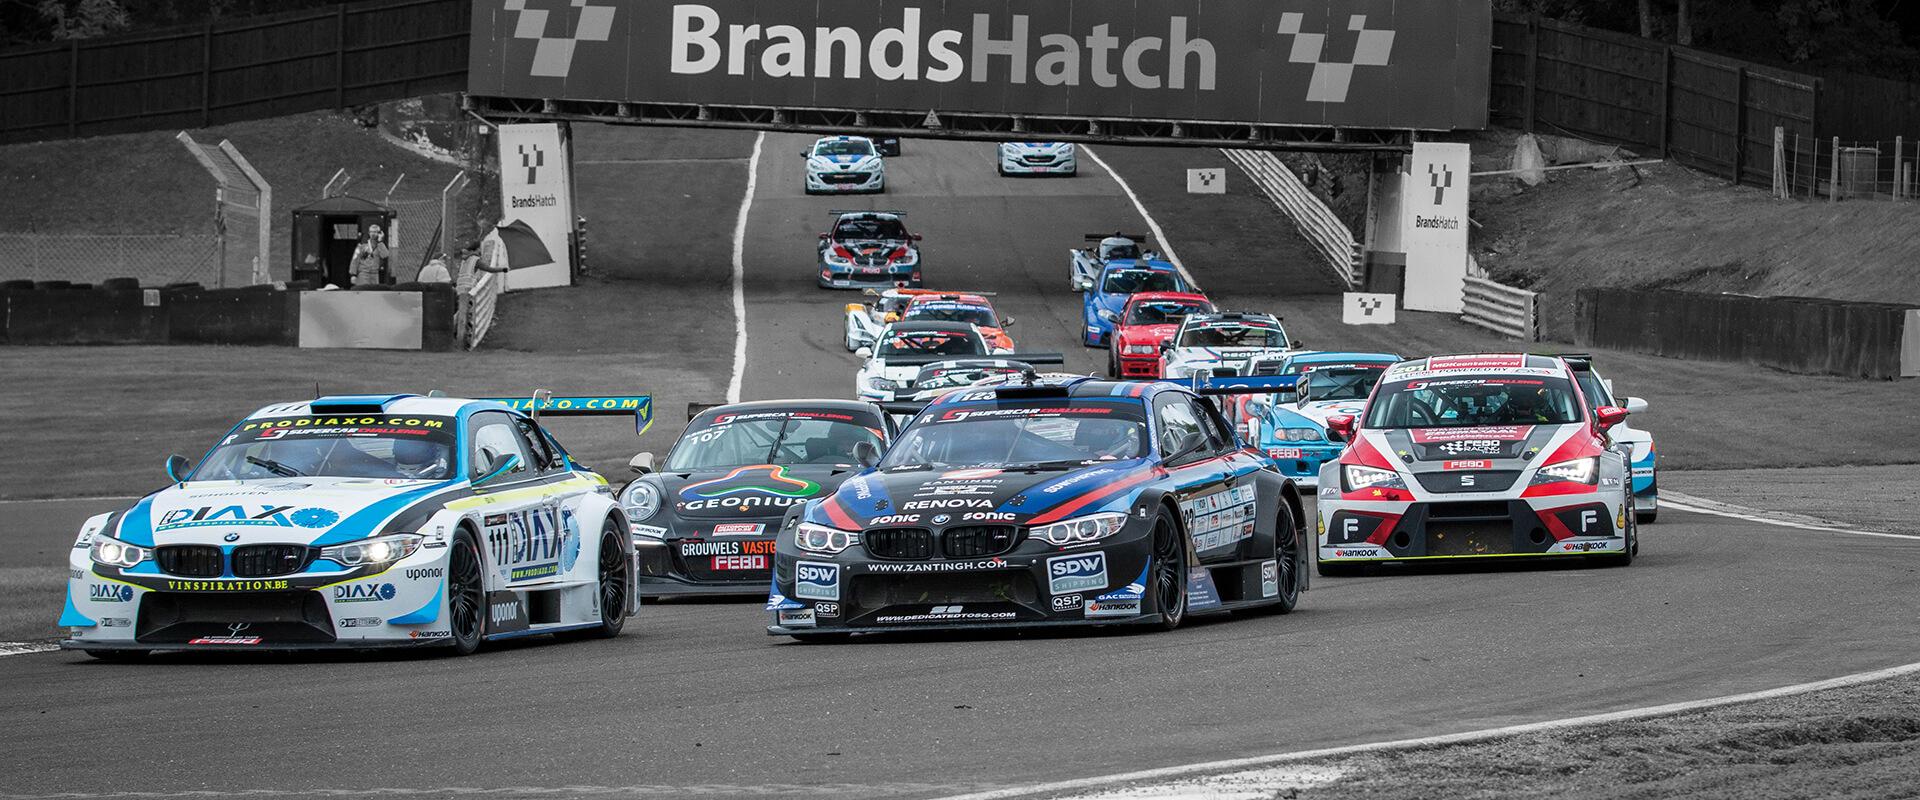 Race Brands Hatch